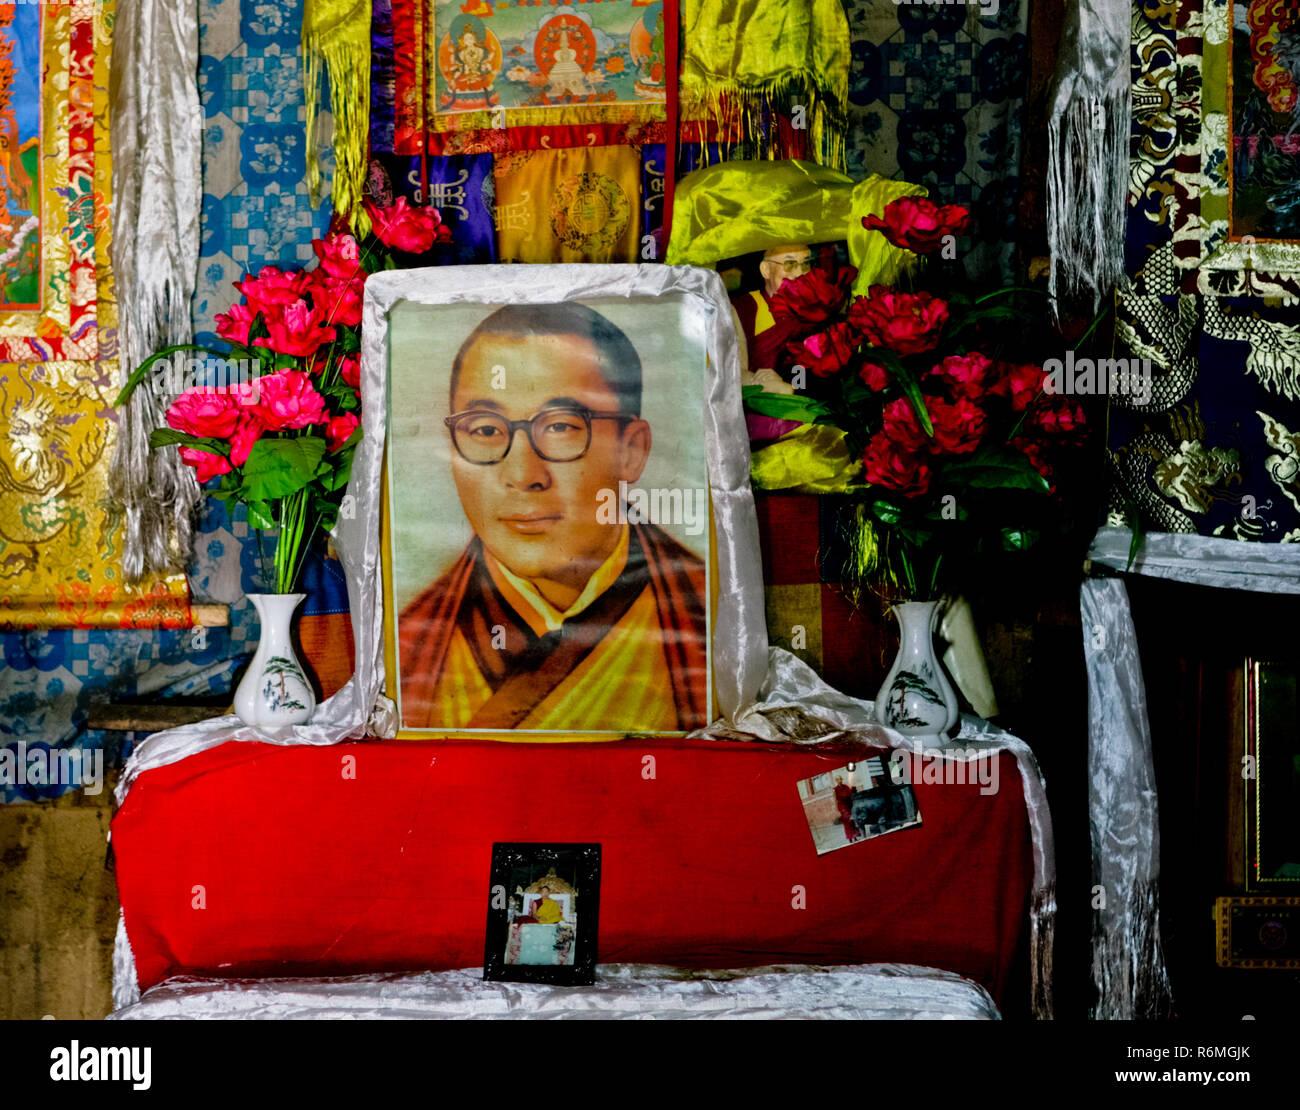 Portrait of young Dalai Lama - Stock Image